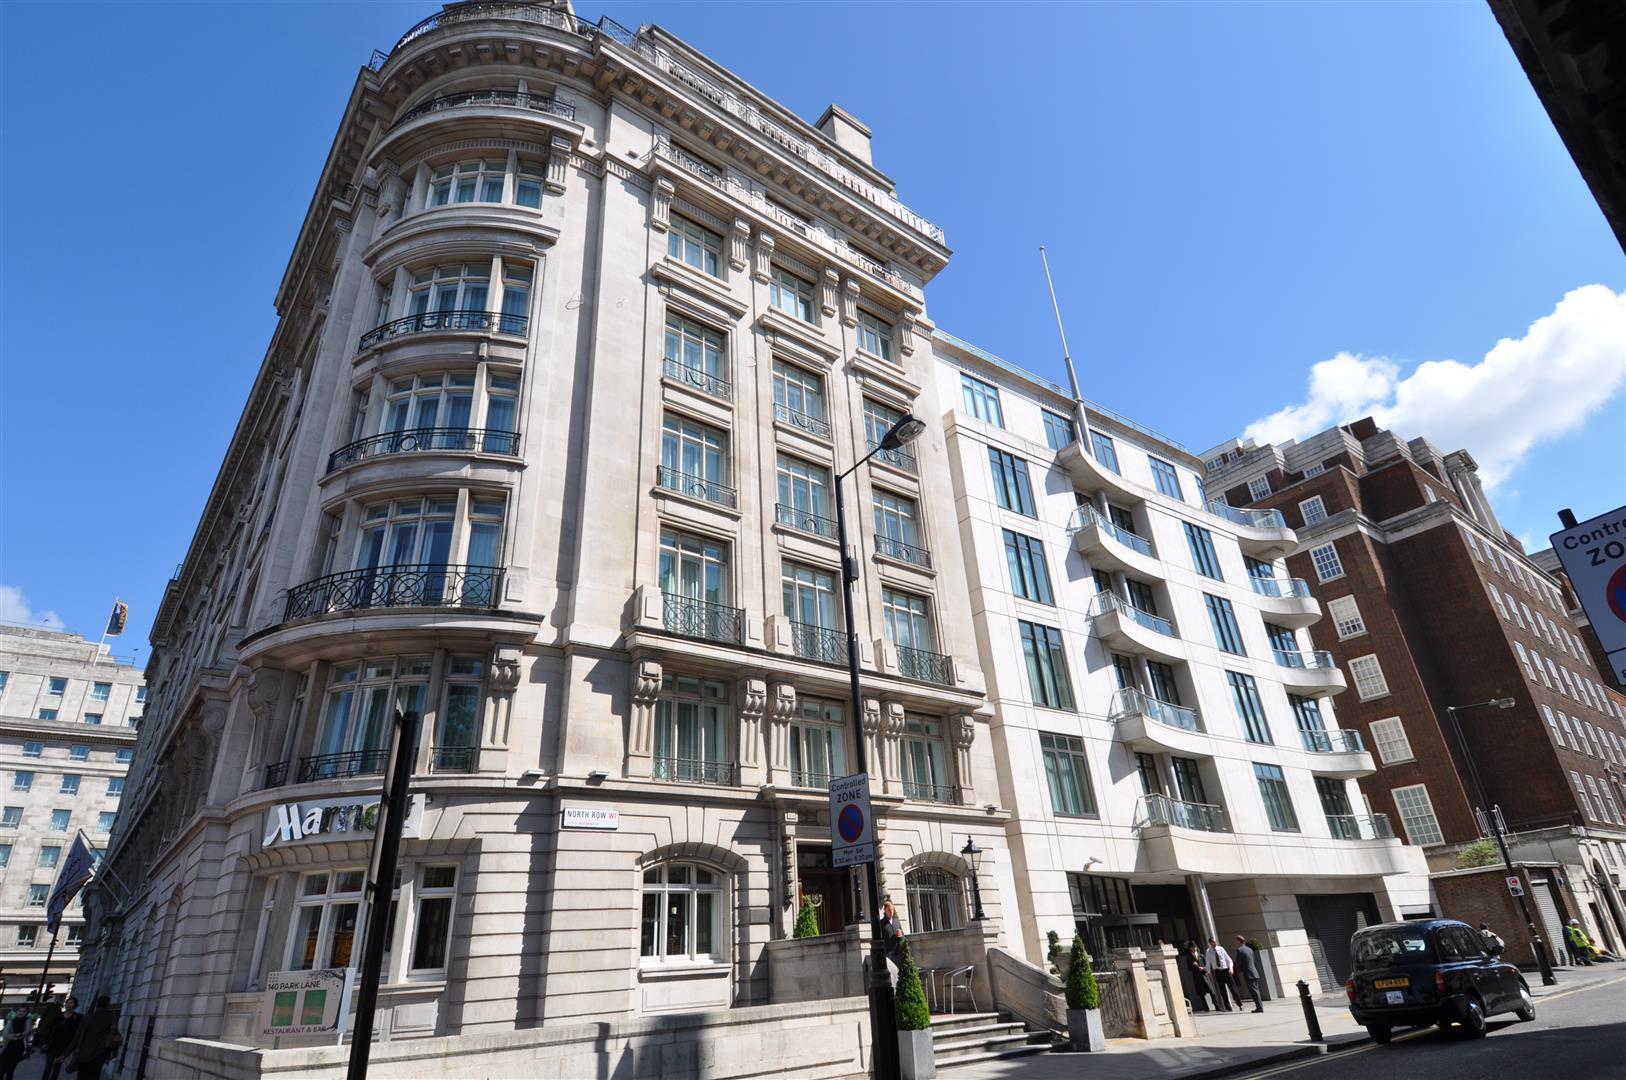 Best Hotels Near Oxford Street, London, England - TripAdvisor